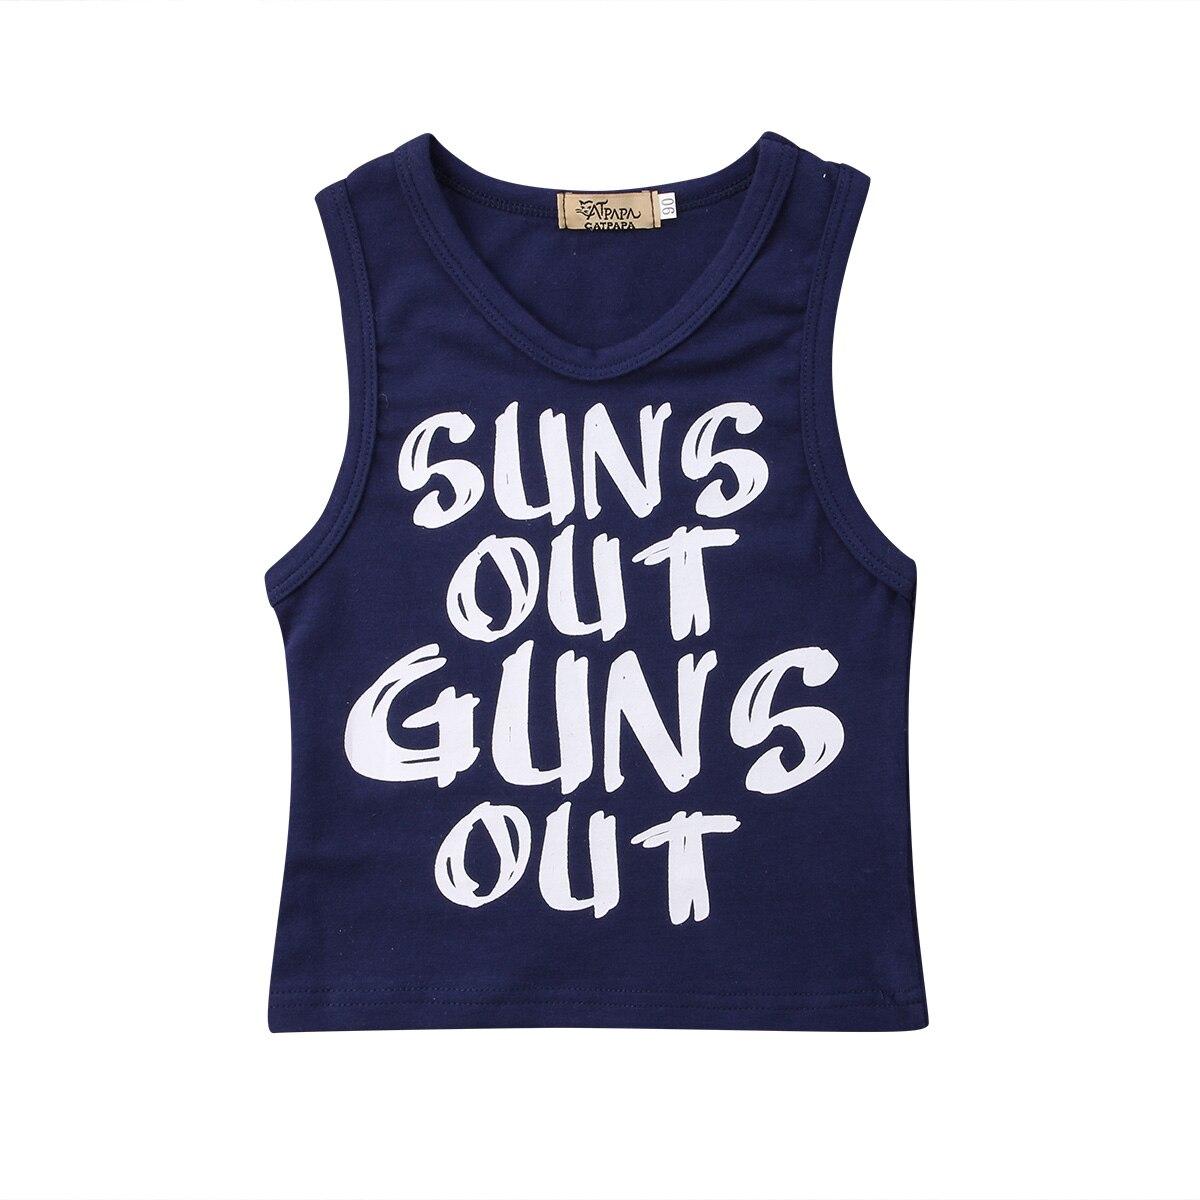 0-24 M Pasgeboren Peuter Kid Baby Boy Brief Print T-shirts Baby Jongens Zomer Sleevelesstee Tops Vest Baby Kleding